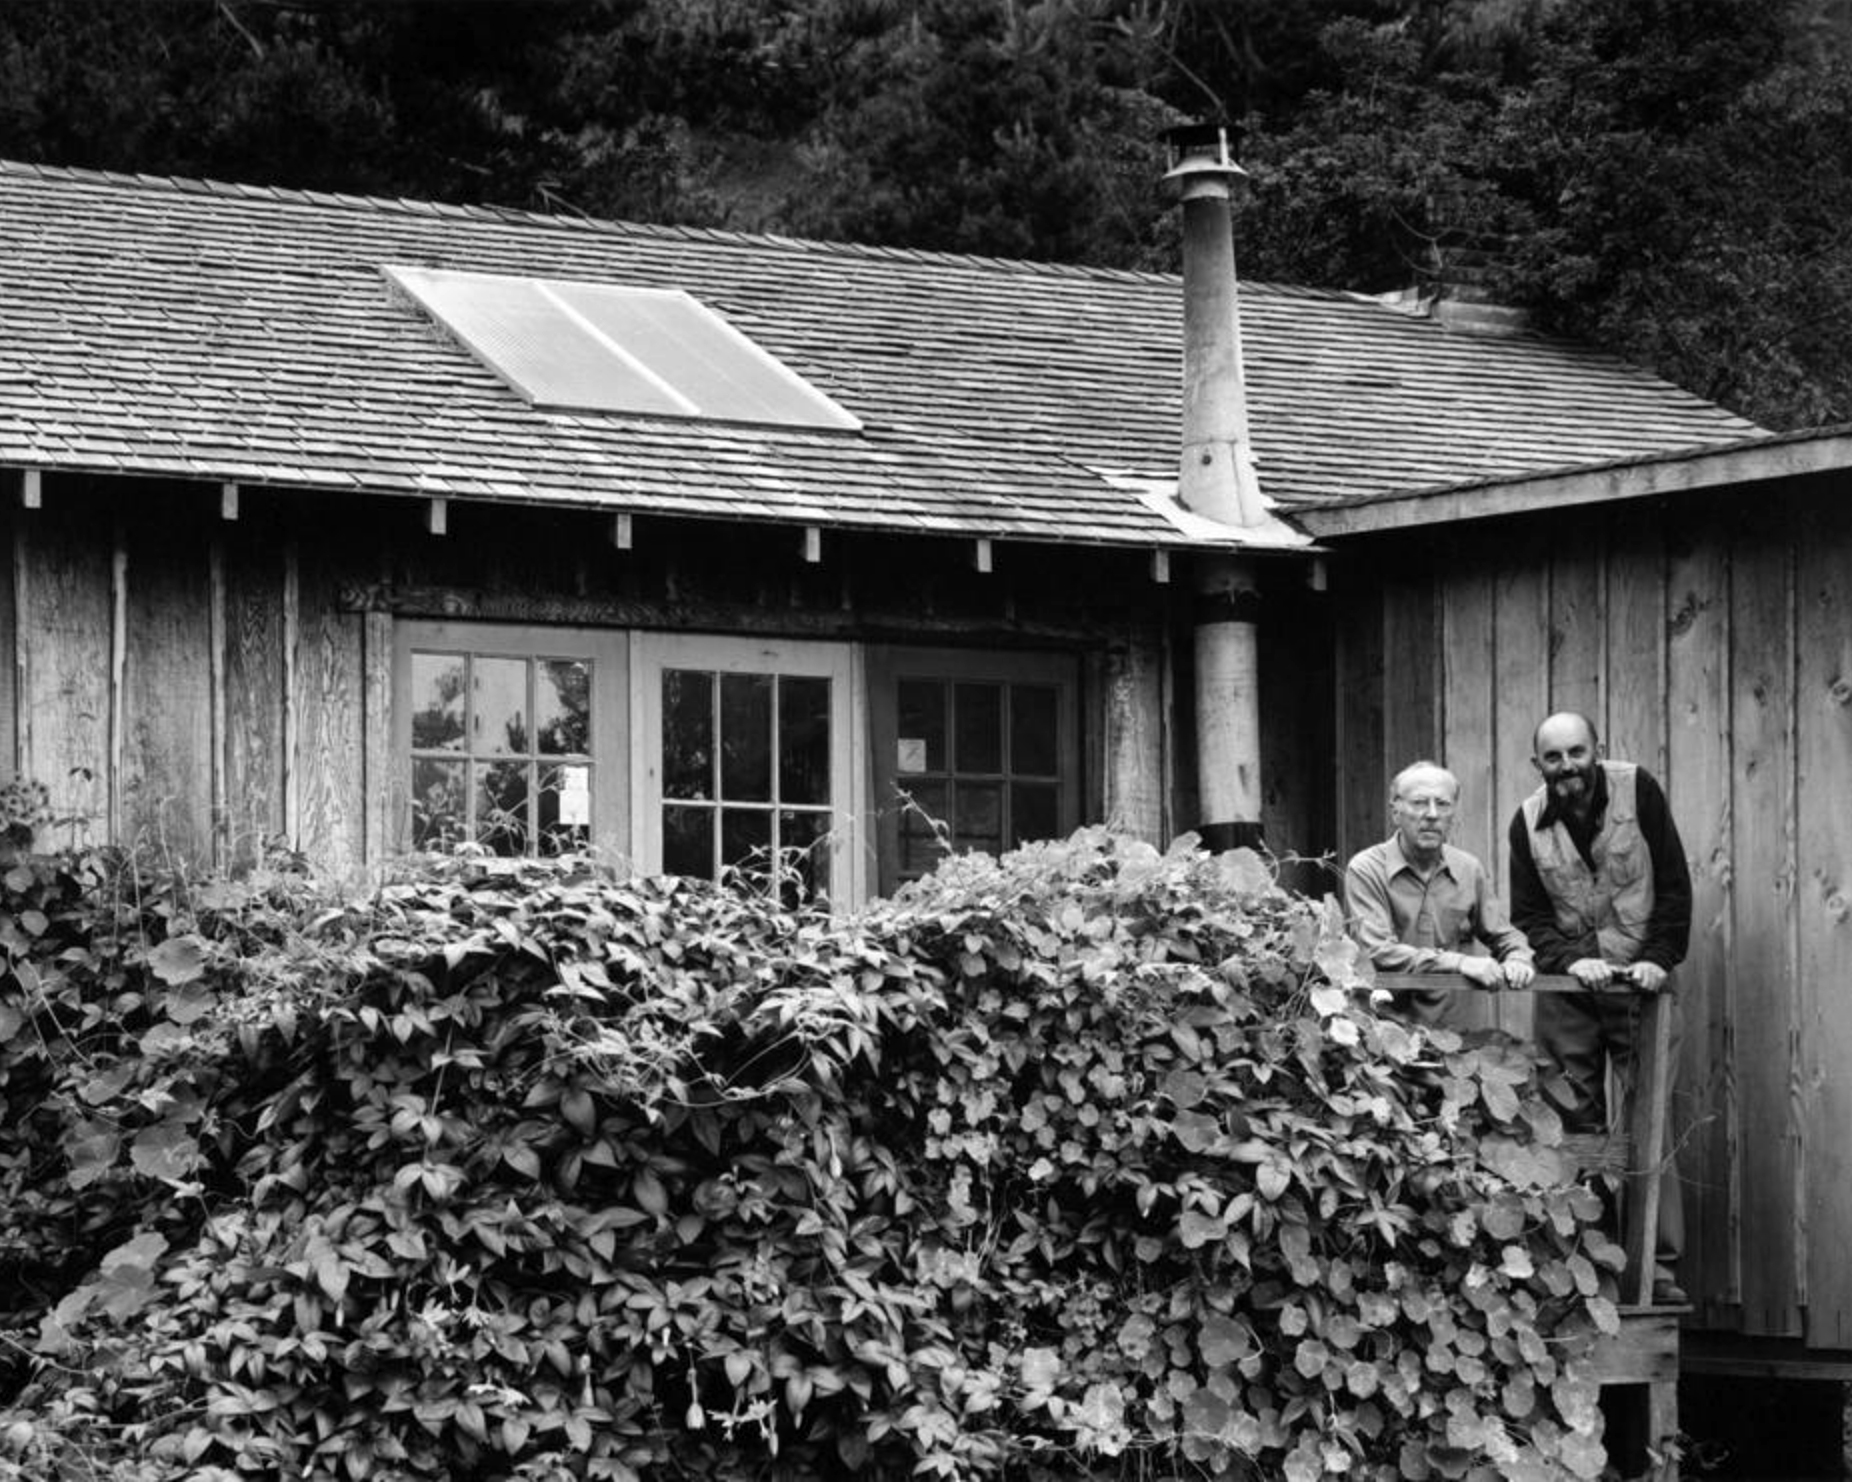 Edward and Ansel at Edward's home on Wildcat Hill ©Pirkle Jones - Carmel Highlands